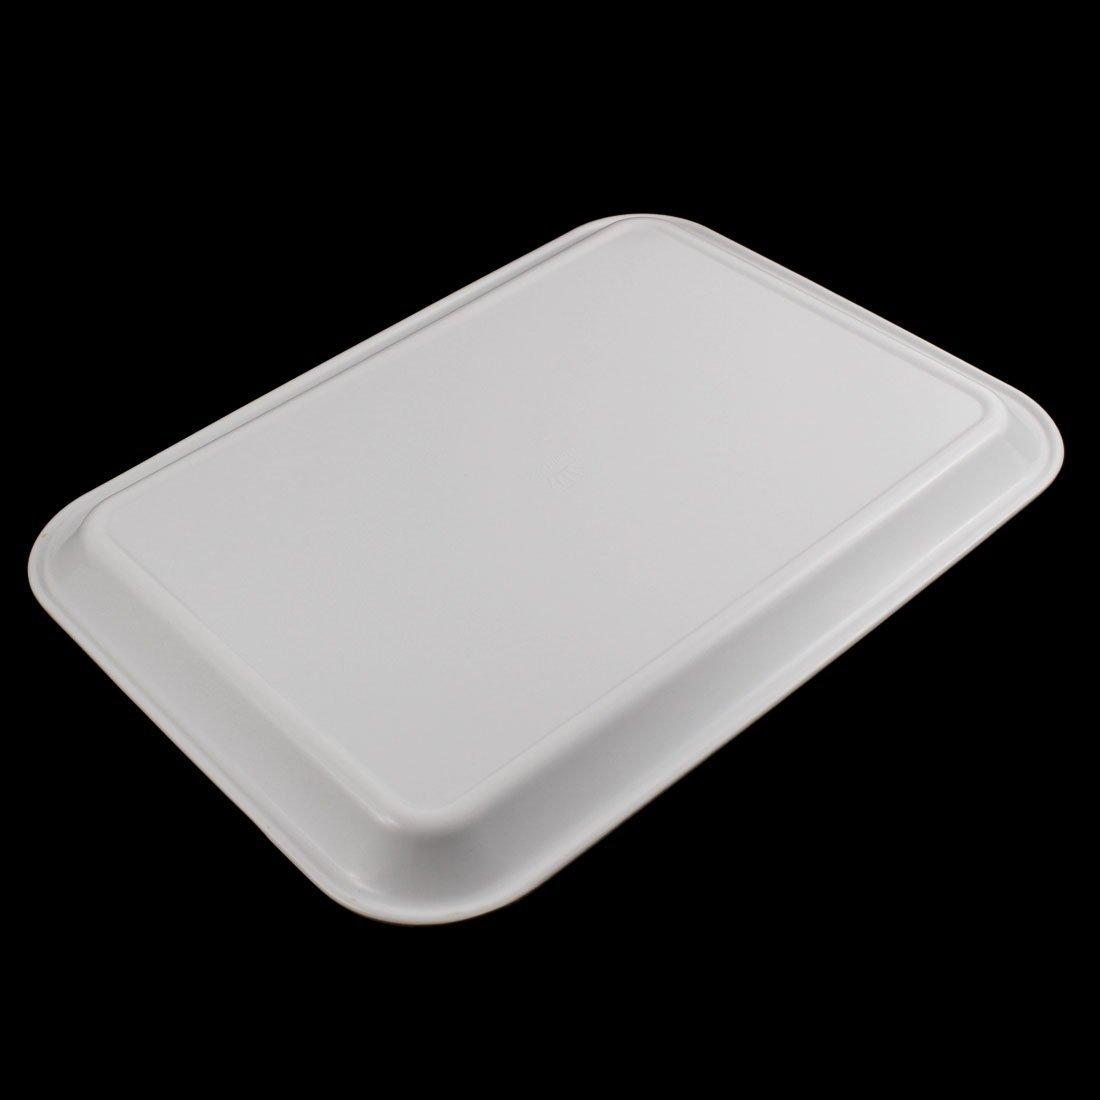 Amazon.com: DealMux Plastic Restaurante Retângulo alimentos em forma de Bandeja 17 polegadas Comprimento: Kitchen & Dining